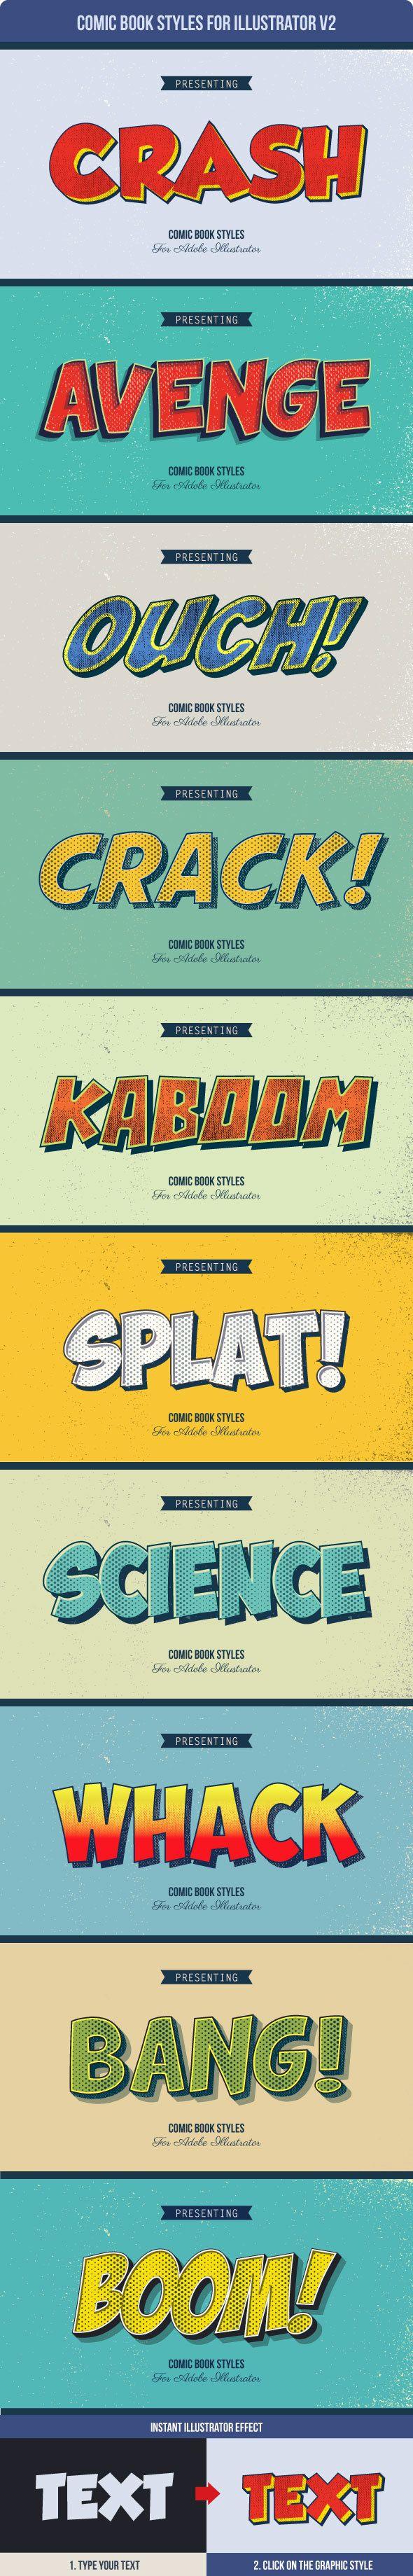 Comic Book Styles for Illustrator #texteffect Download: http://graphicriver.net/item/comic-book-styles-for-illustrator-v2/14318854?ref=ksioks